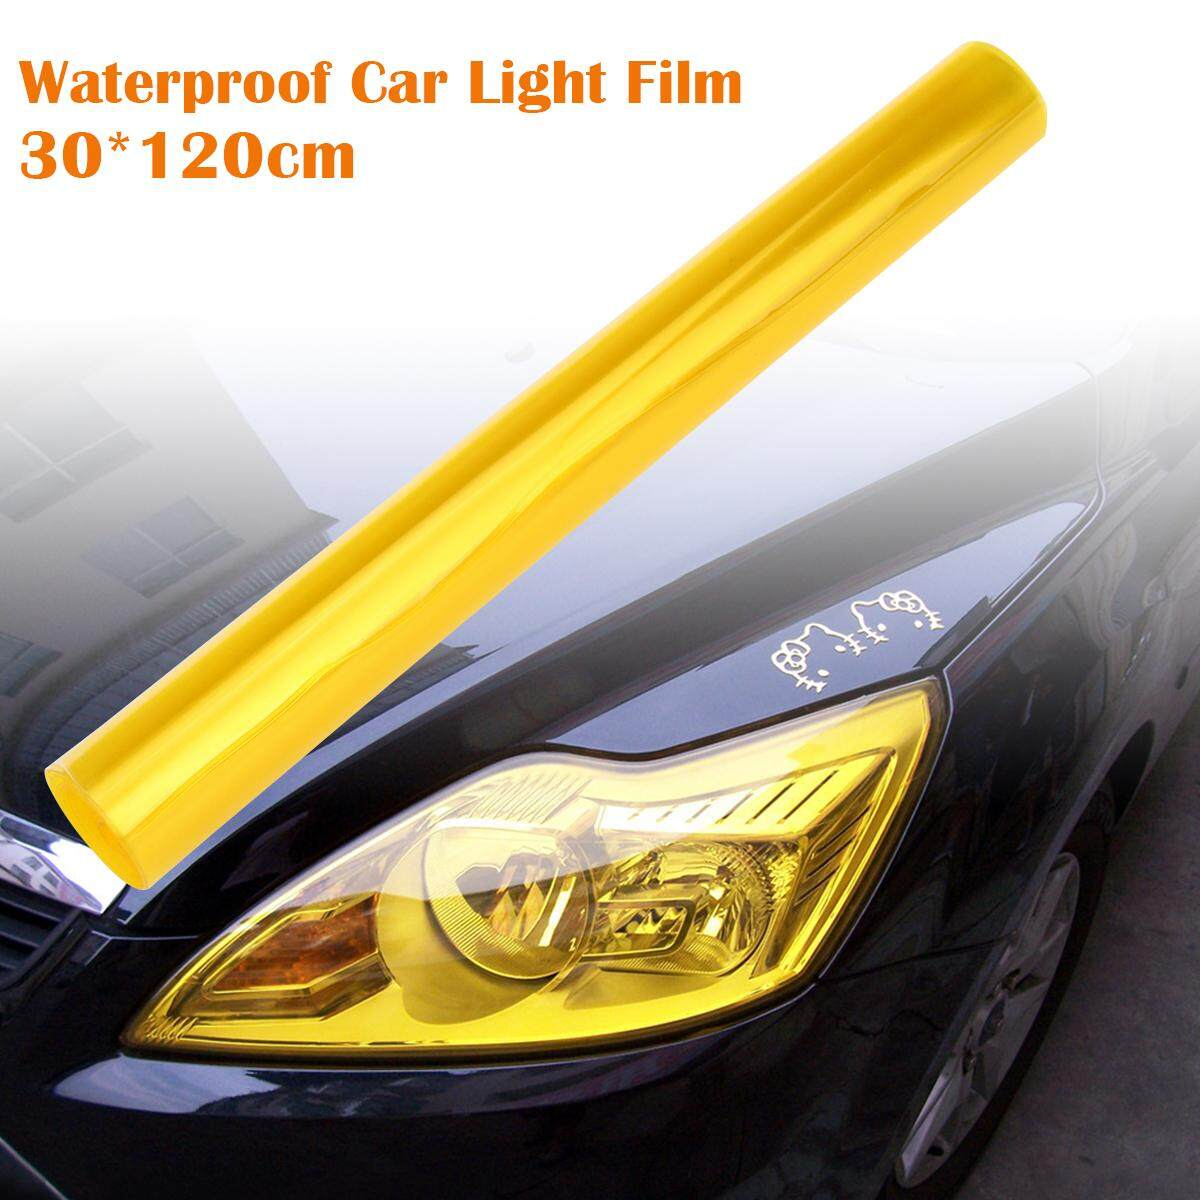 FOXNOVO 30*120cm Waterproof Car Auto Fog Light Headlight Tint Film Lights Color-Changing